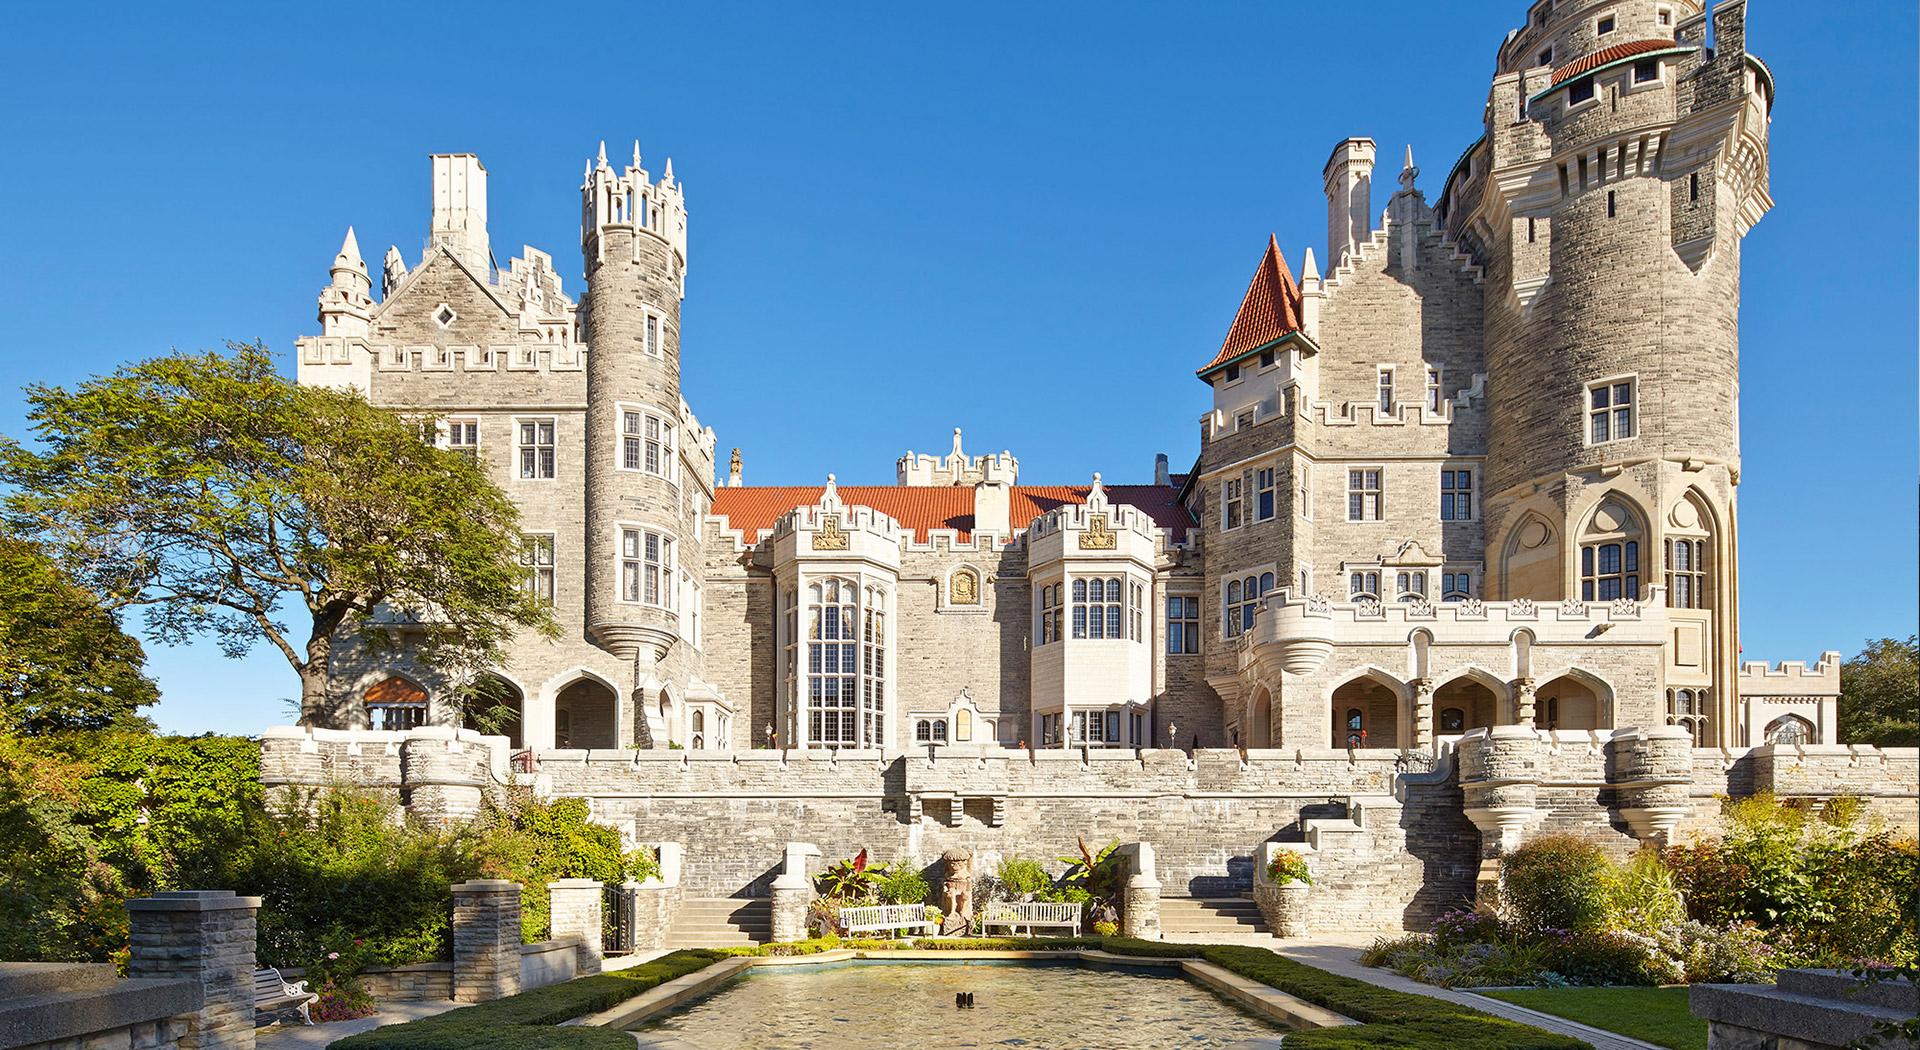 قلعه ی کازا لوما